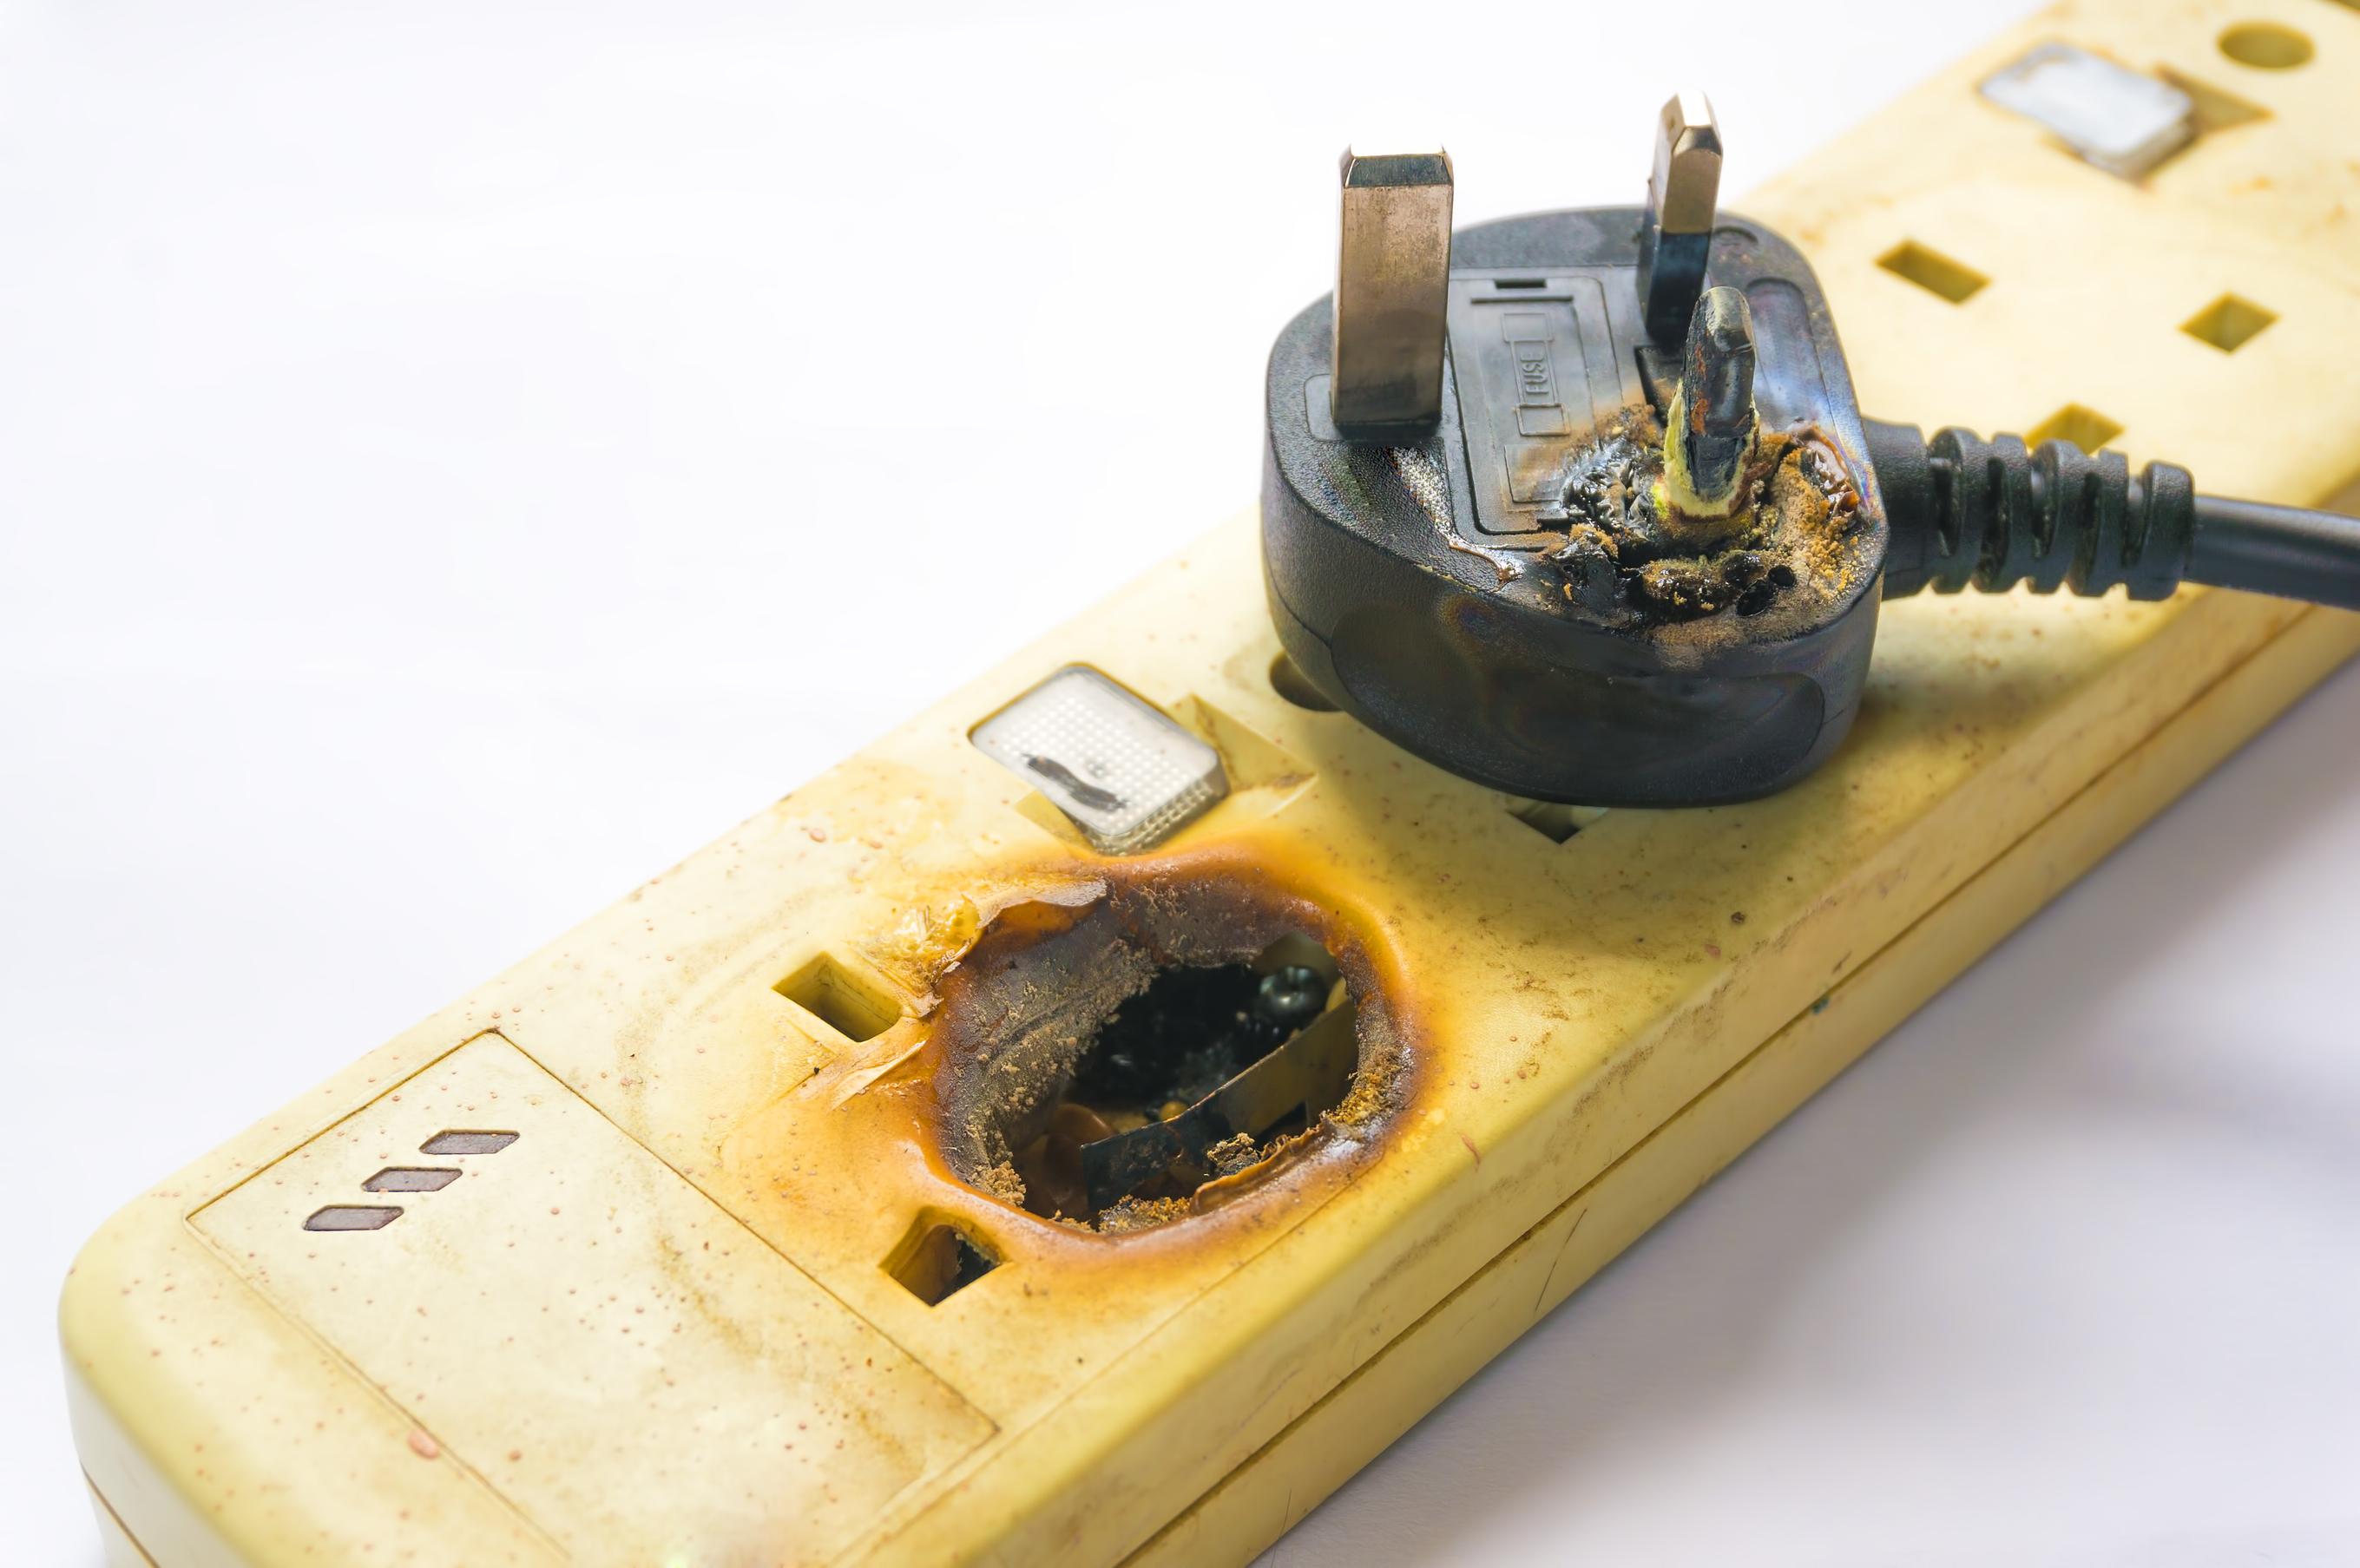 electrical testing of appliances in rental properties